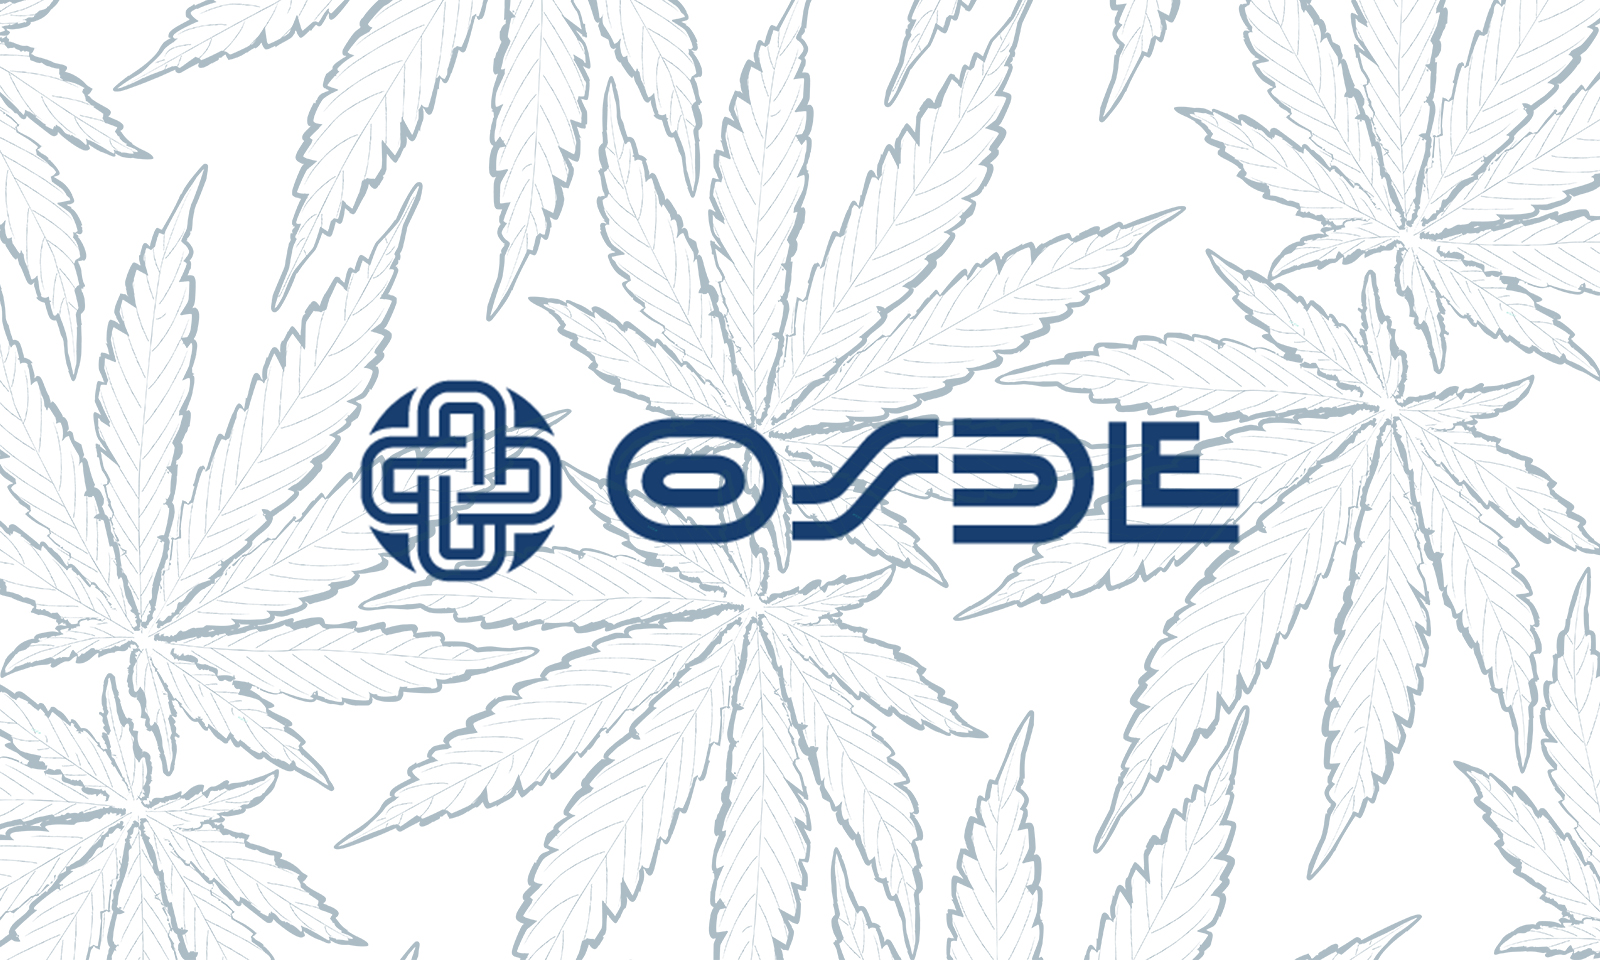 OSDE Cannabis